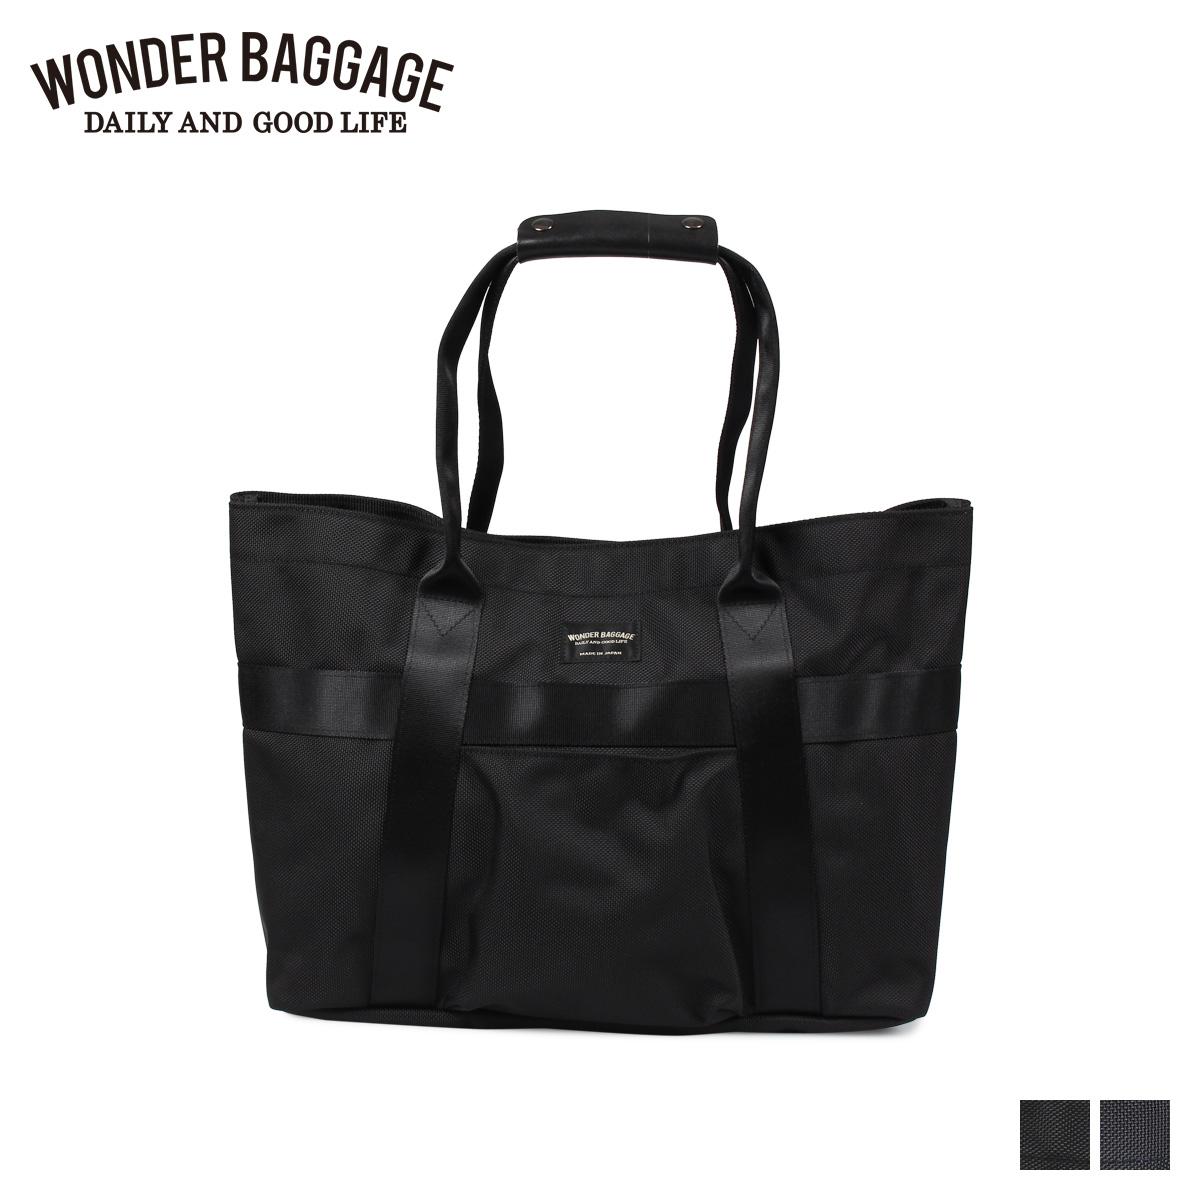 WONDER BAGGAGE GOODMANS LIGHT TOTE ワンダーバゲージ トートバッグ バッグ グッドマンズ メンズ レディース ブラック ネイビー 黒 WB-G-023